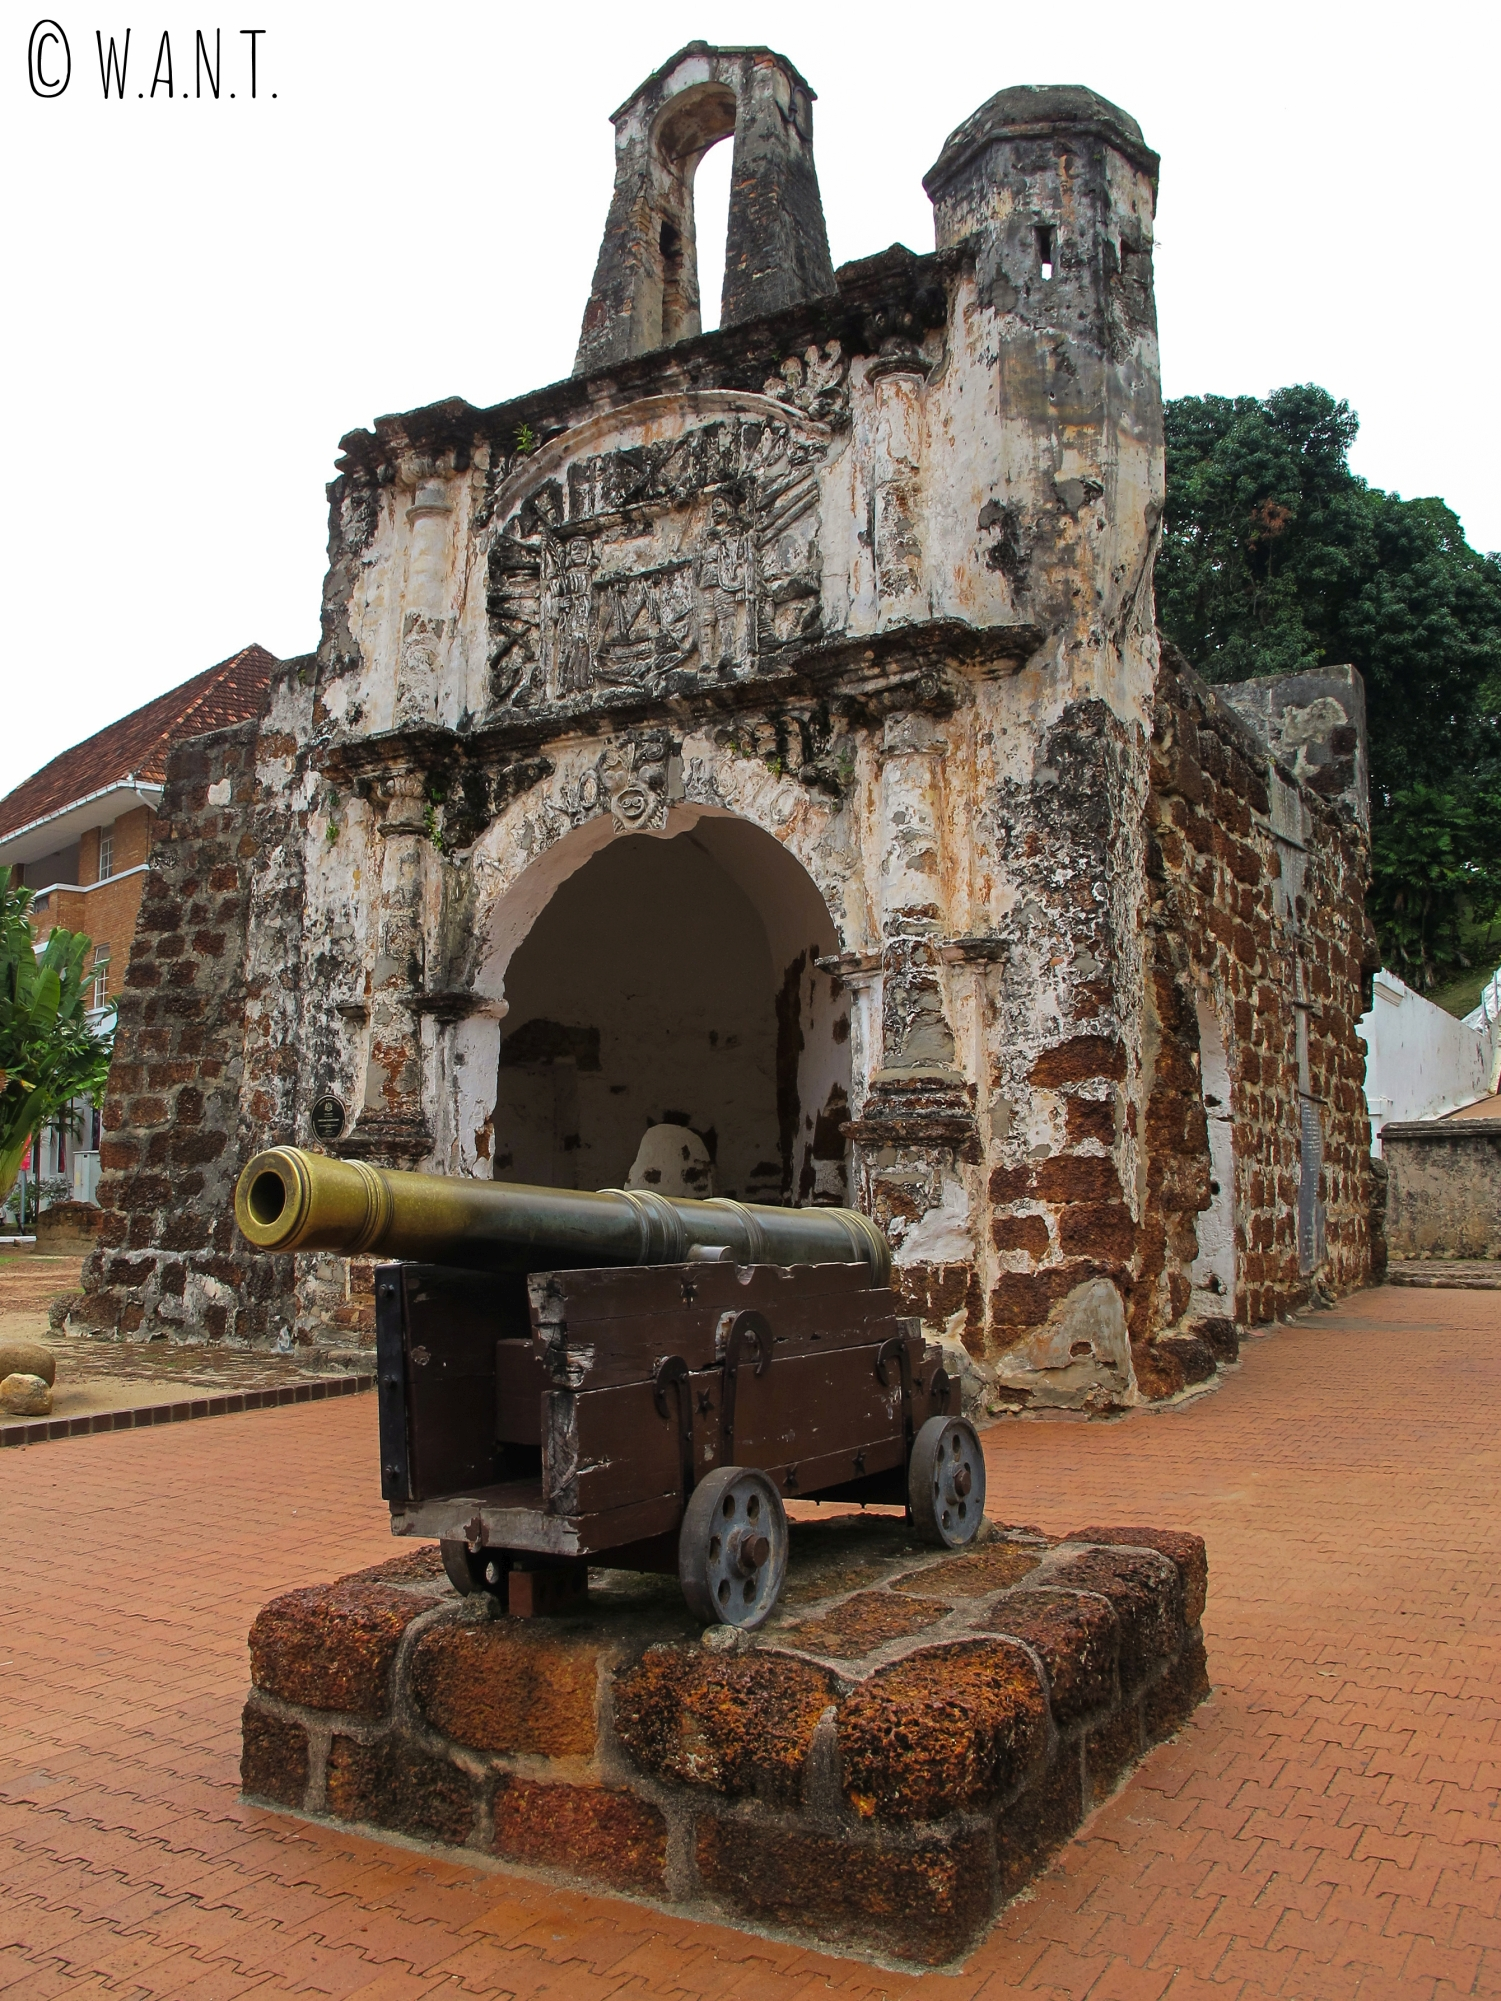 Porta de Santiago, dernier vestige de la forteresse A'Famosa de Malacca